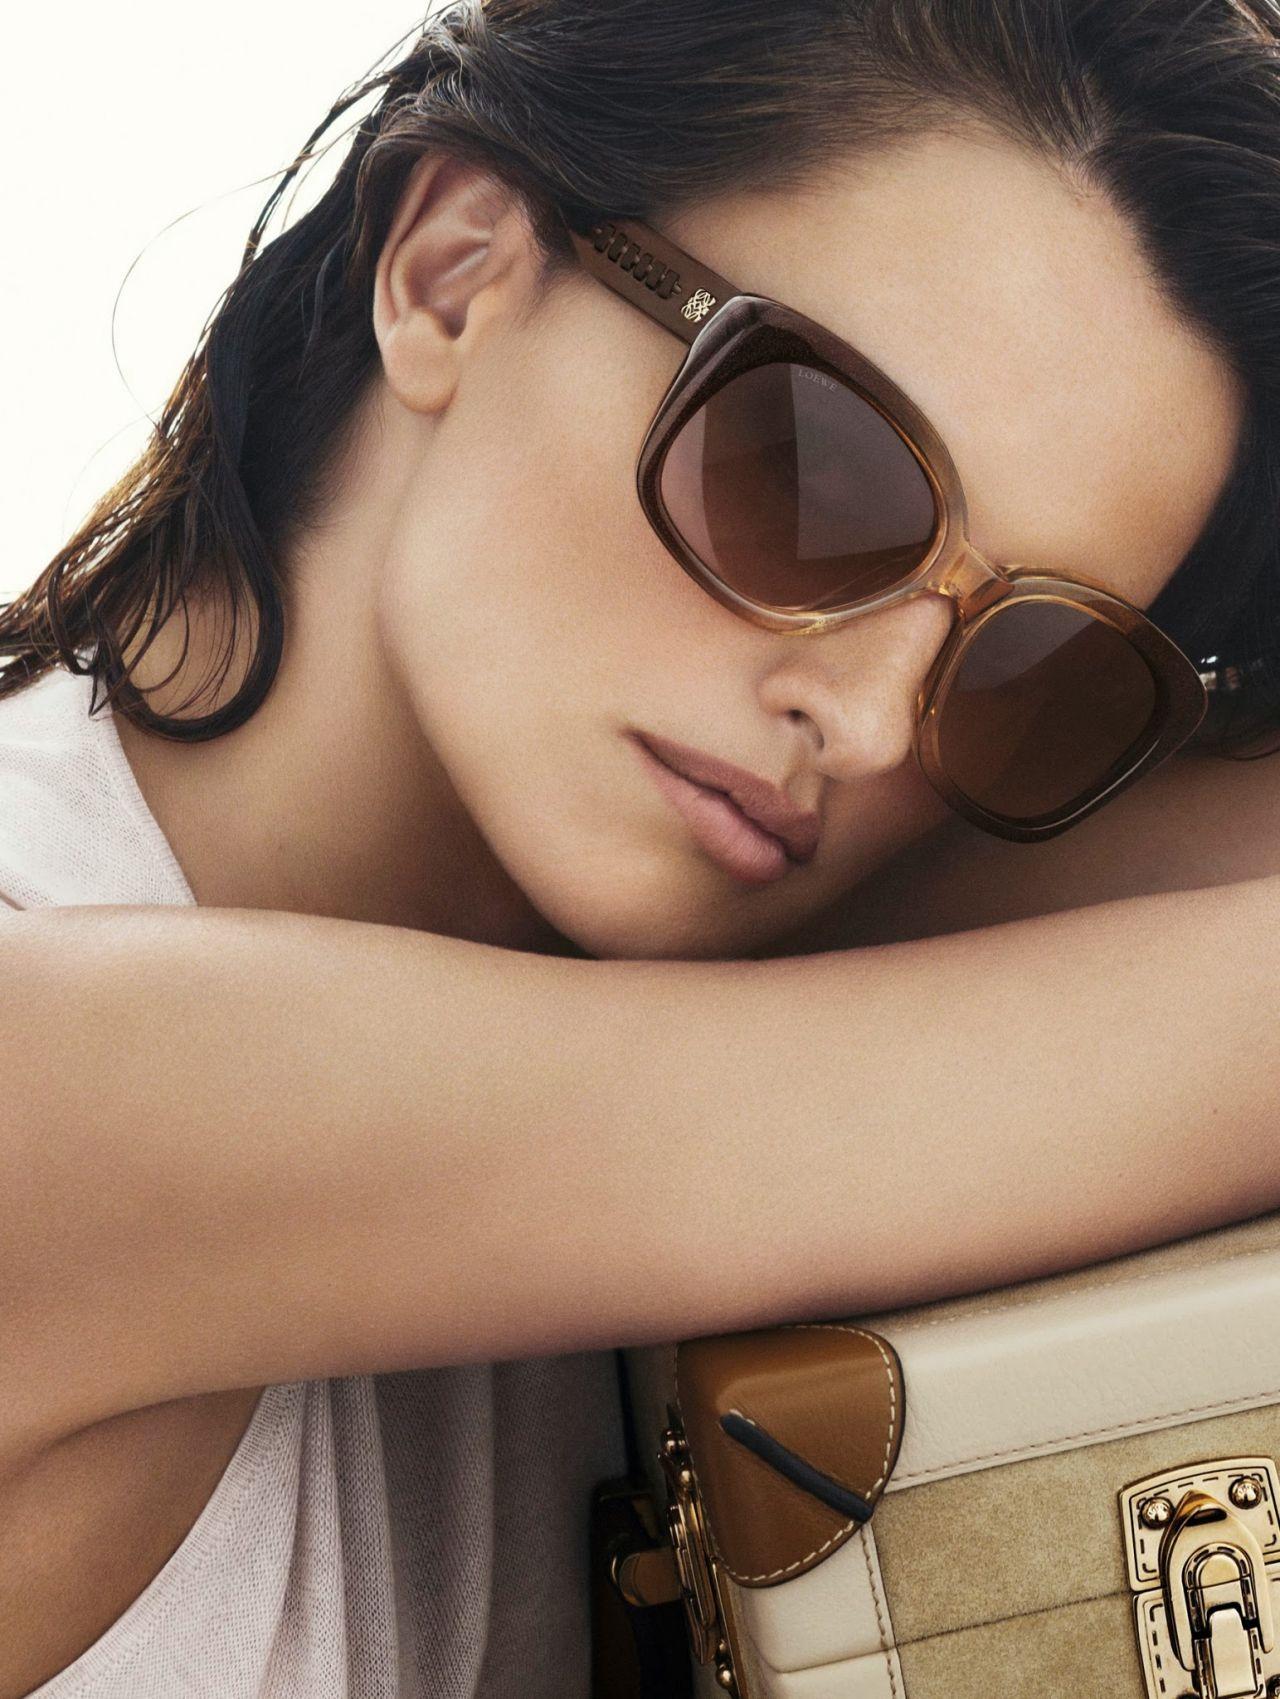 Penelope Cruz - Loewe Spring/Summer 2014 Photoshoot by Mert Alas & Marcus Piggott